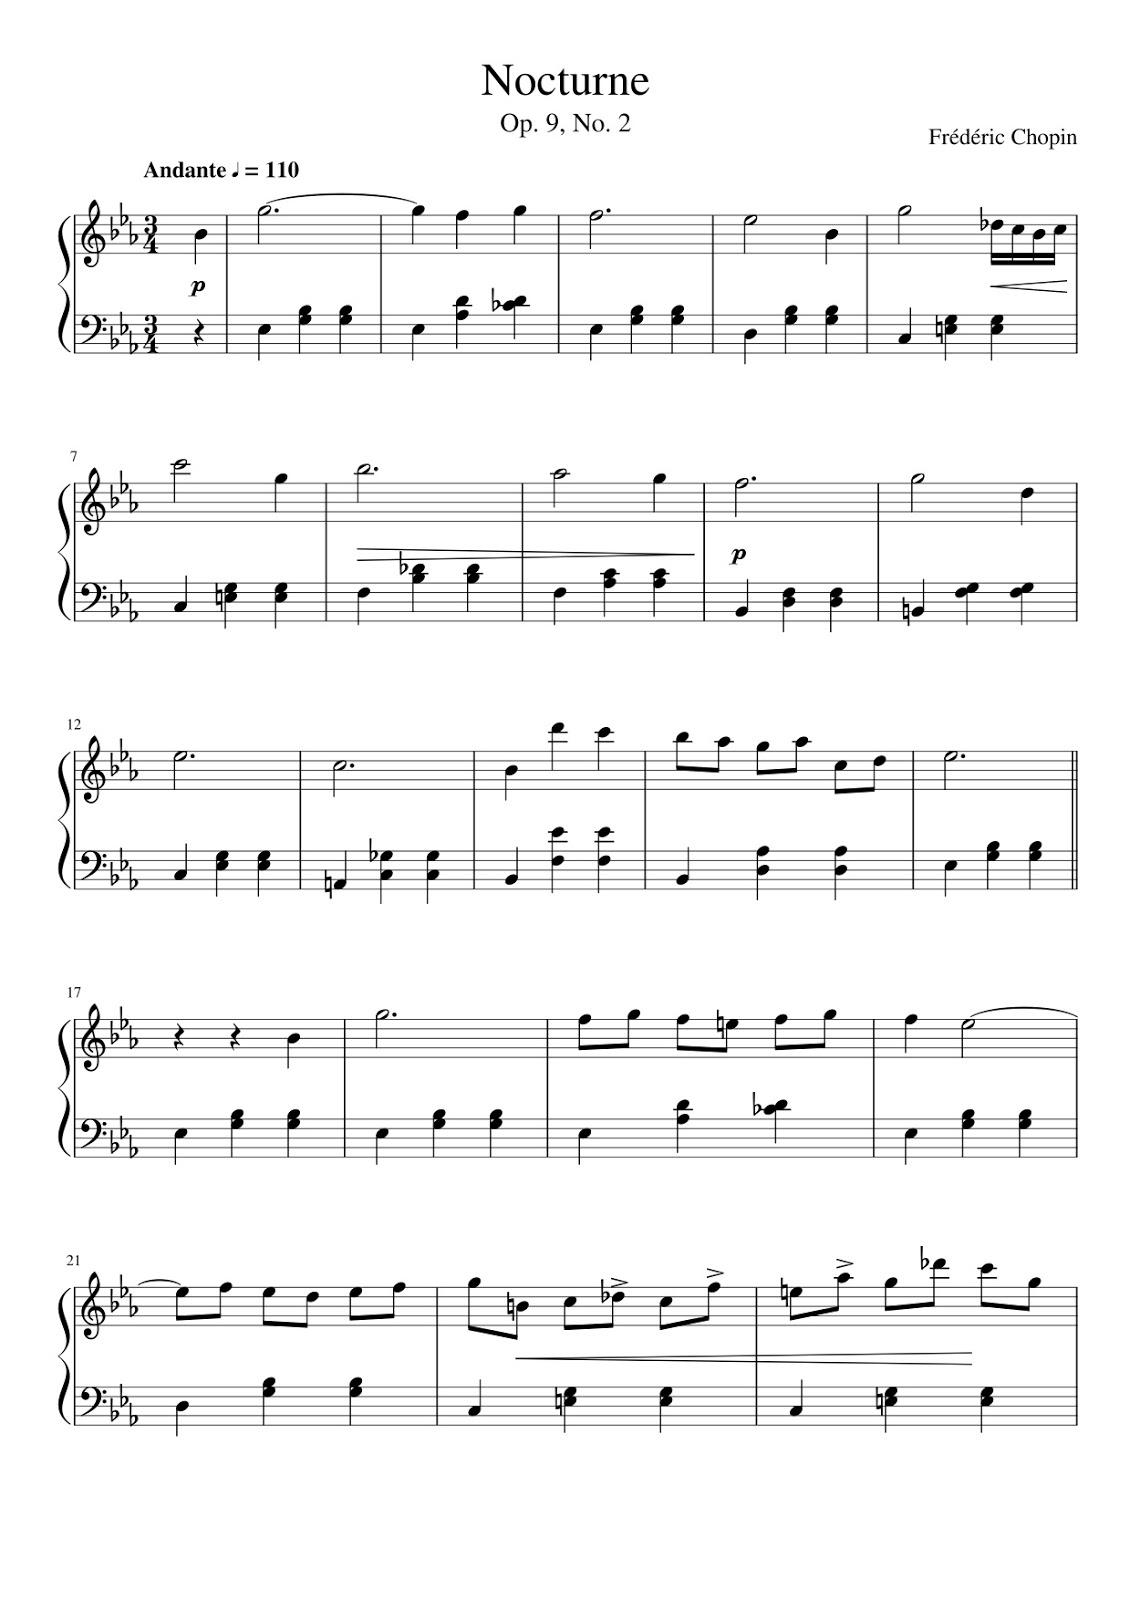 chopin nocturne op 9 no 2 piano tutorial